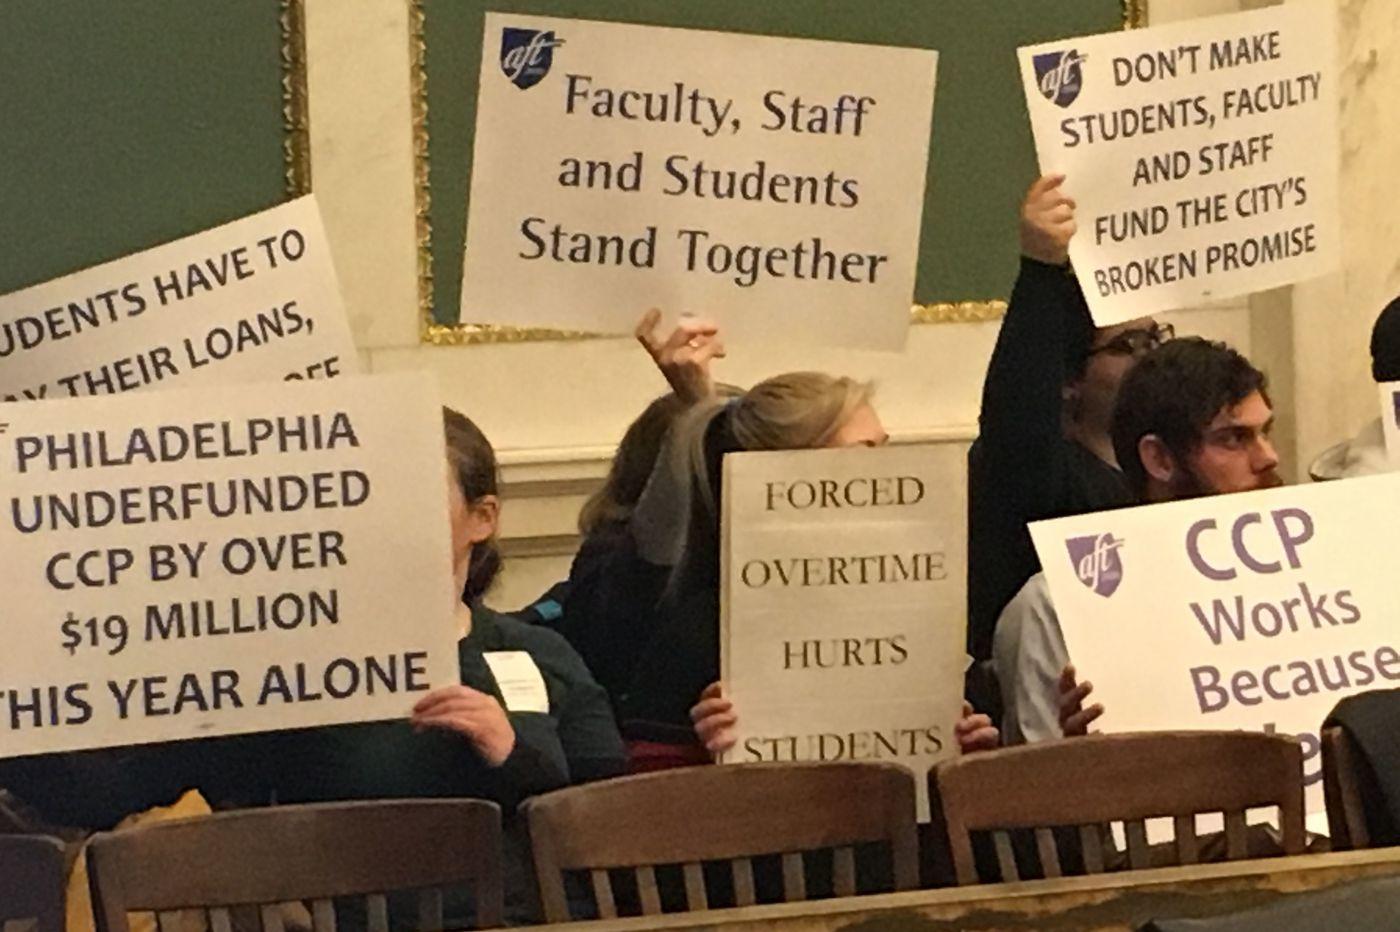 Is Philadelphia properly funding its community college?